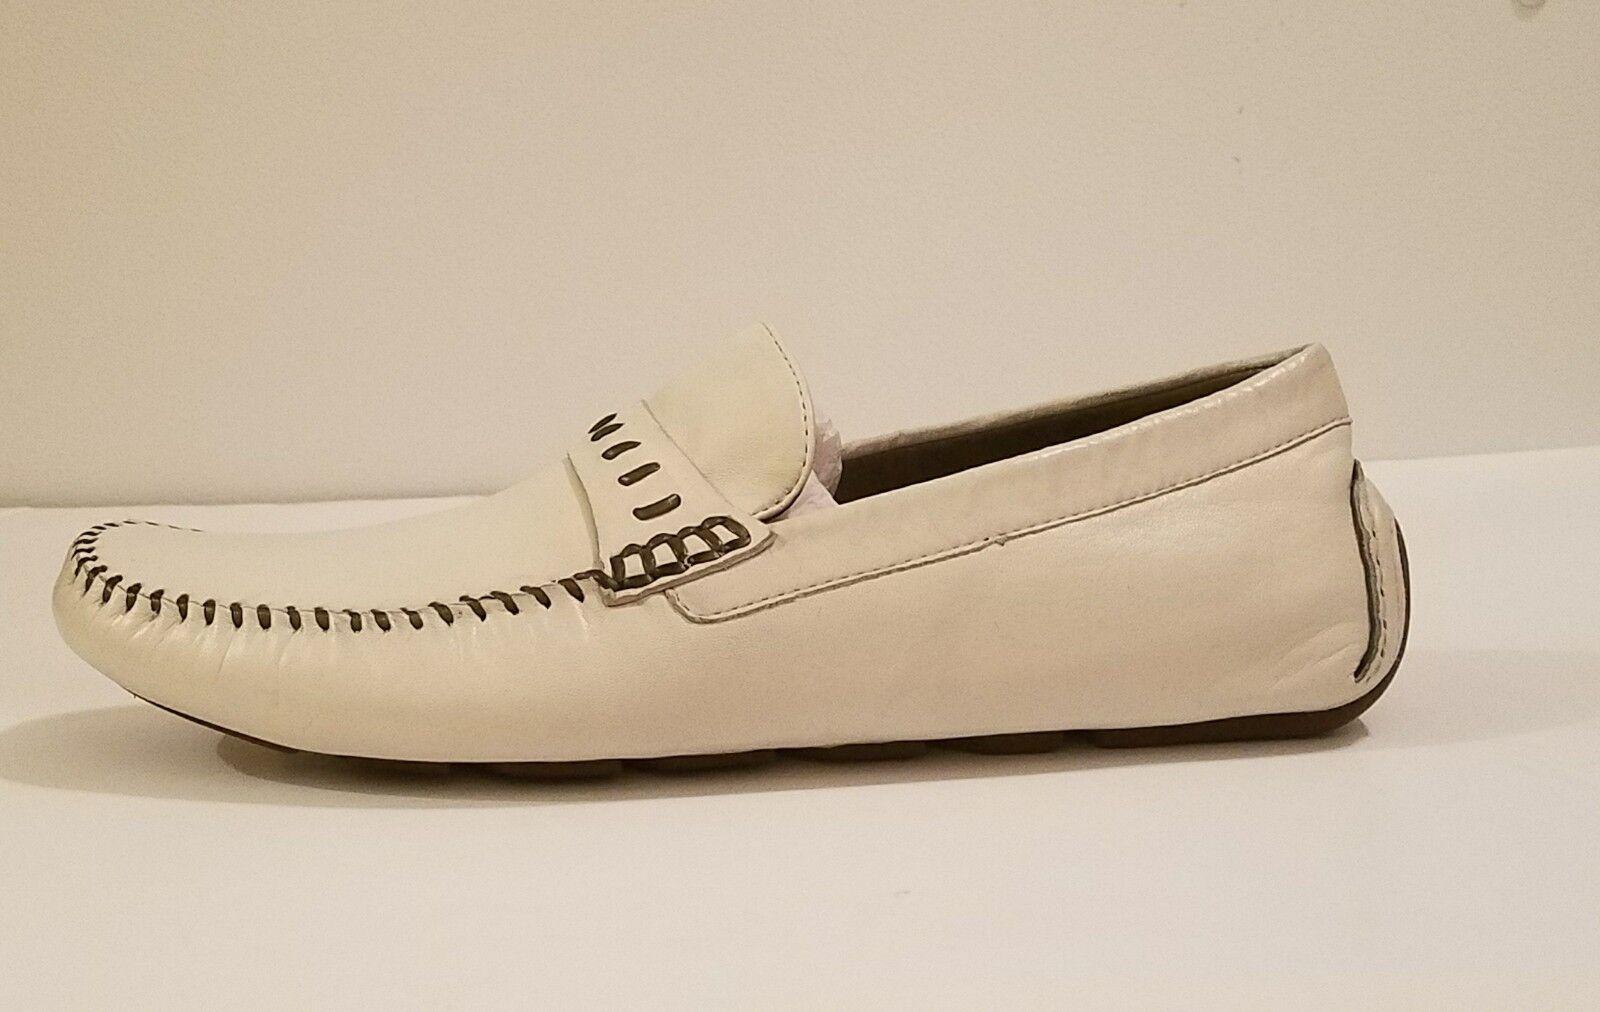 NWB Robert Zur Men's Glove Penny Loafers Dune True Glove Ivory White sz 10.5